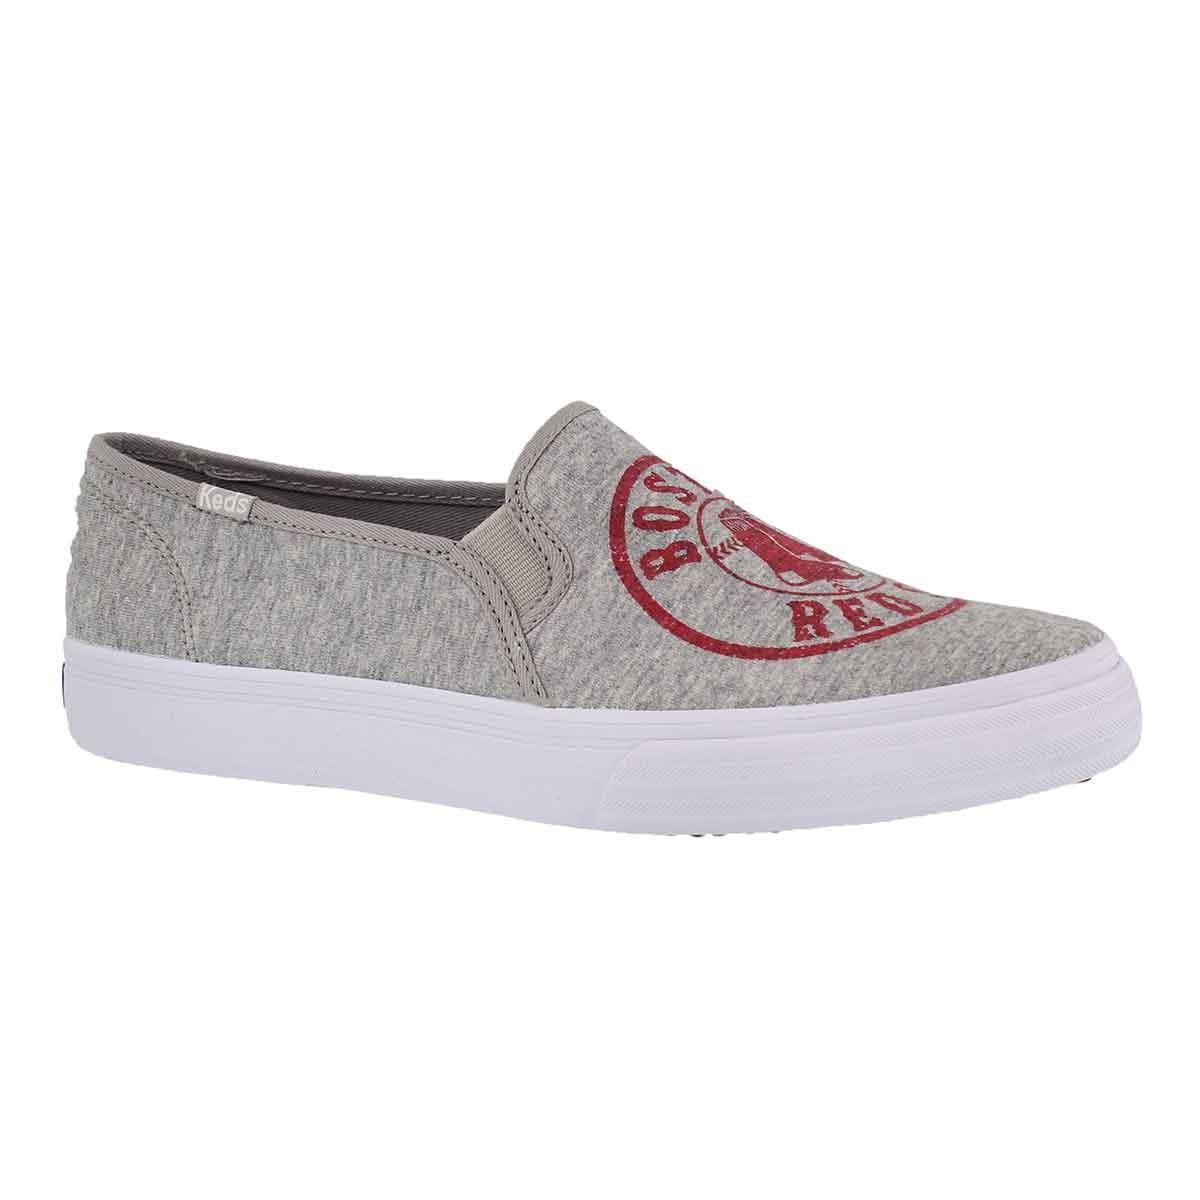 Women's DOUBLE DECKER Red Sox grey sneakers